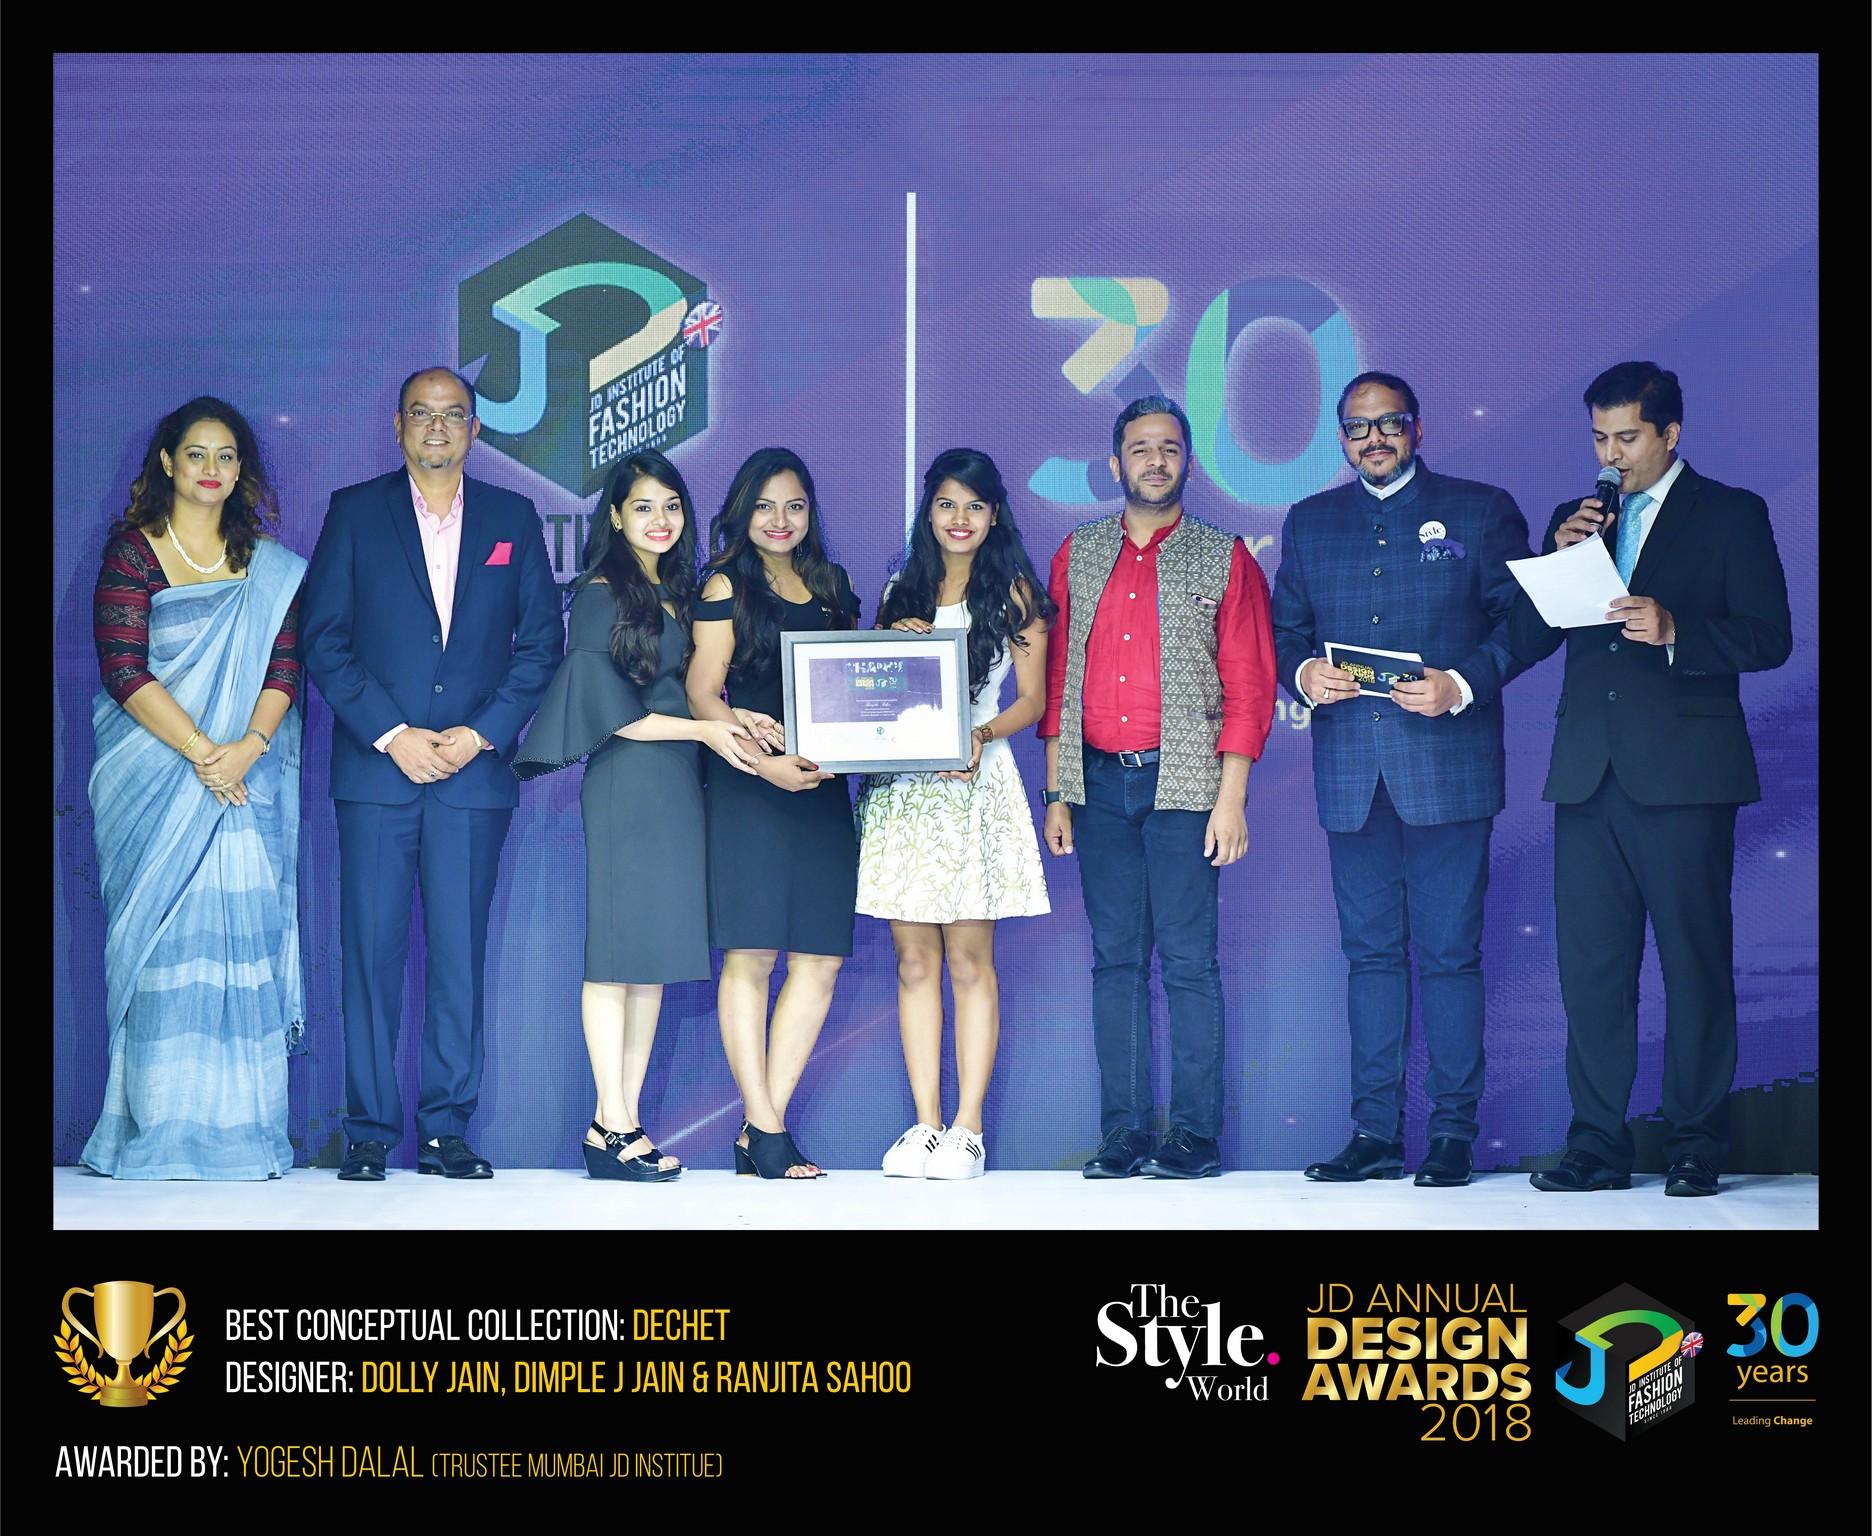 Dechet – Change – JD Annual Design Awards 2018 | Designer: Dimple, Dolly and Ranjita DFD July A 2017 | Photography : Jerin Nath (@jerin_nath) dechet - 17 - Dechet – Change – JD Annual Design Award 2018